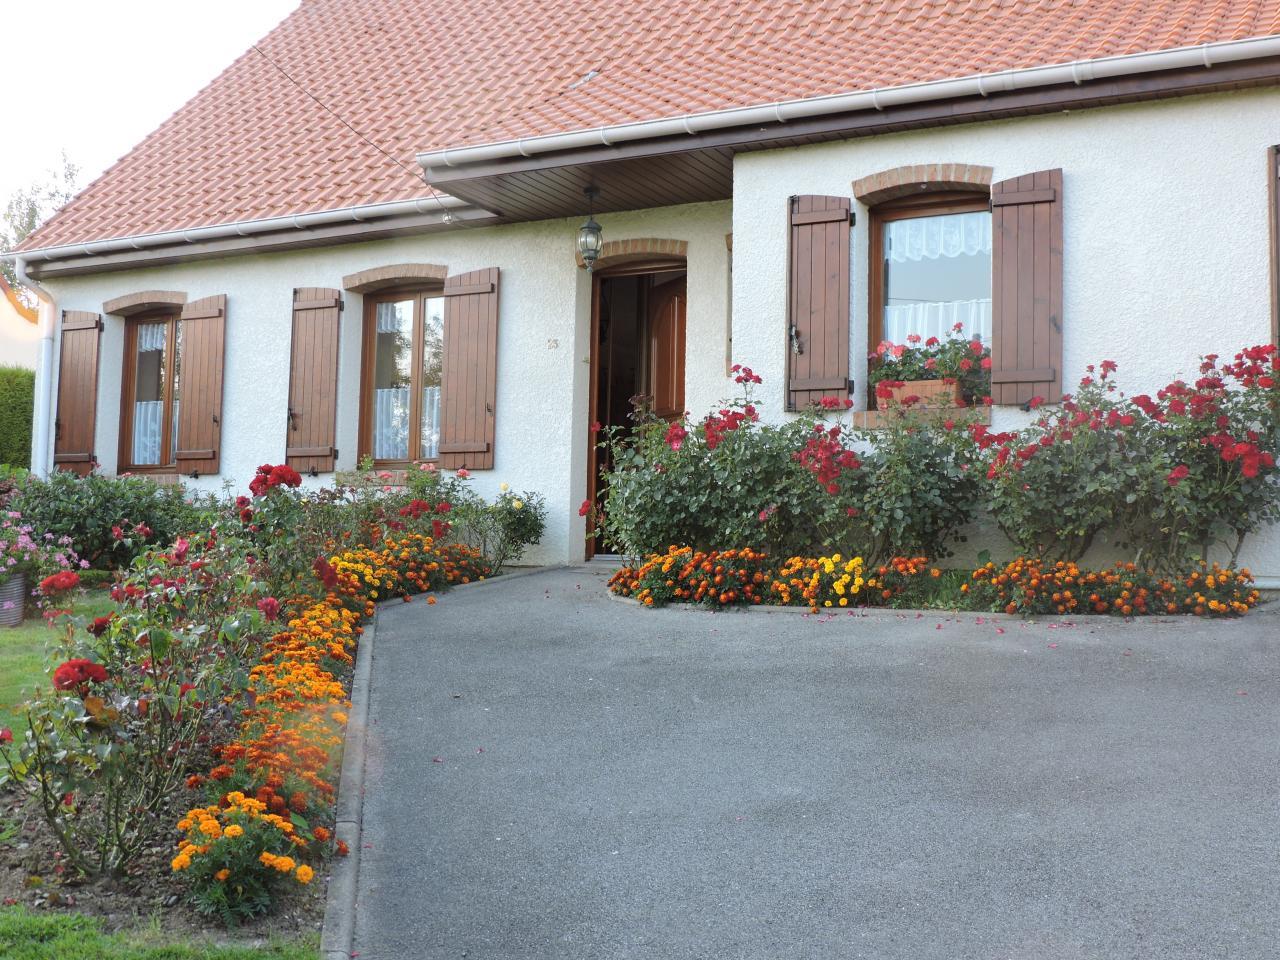 Maisons fleuries 2014 (55)